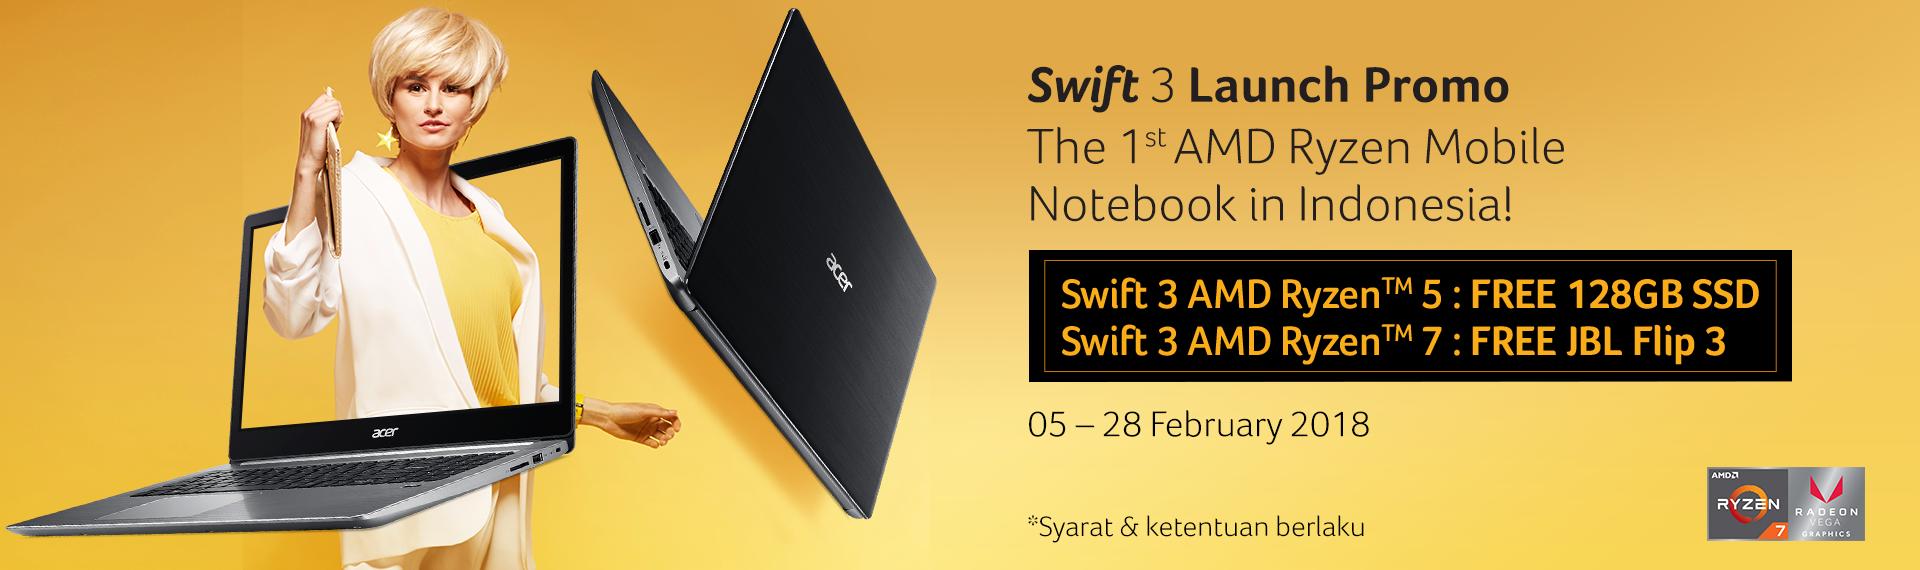 Promo Spesial Acer Swift 3, Notebook Pertama dengan AMD Ryzen Mobile!